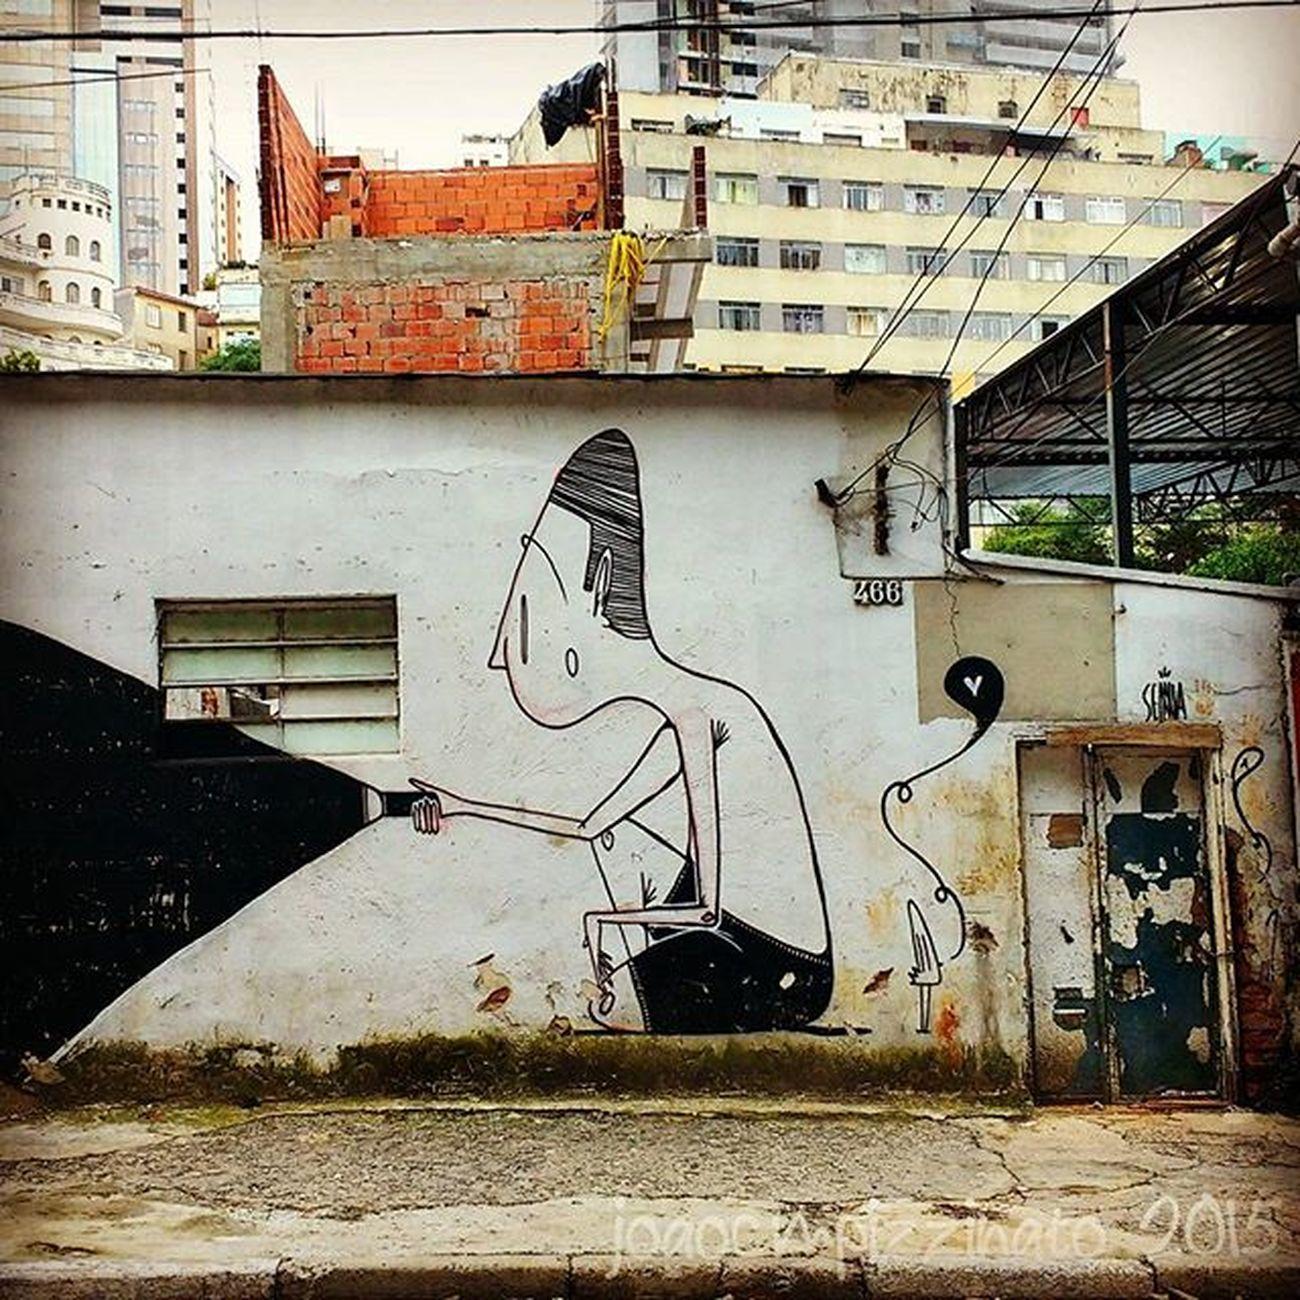 Graffiti Graffitiart Art Streetart UrbanART Streetphotography Urban Streetphoto_brasil Colors City Belavista Saopaulo Brasil Photograph Photography Jj_urbex Urbexbrasil Urbexsp Flaming_abstracts Mundoruasp Olhonaruasp